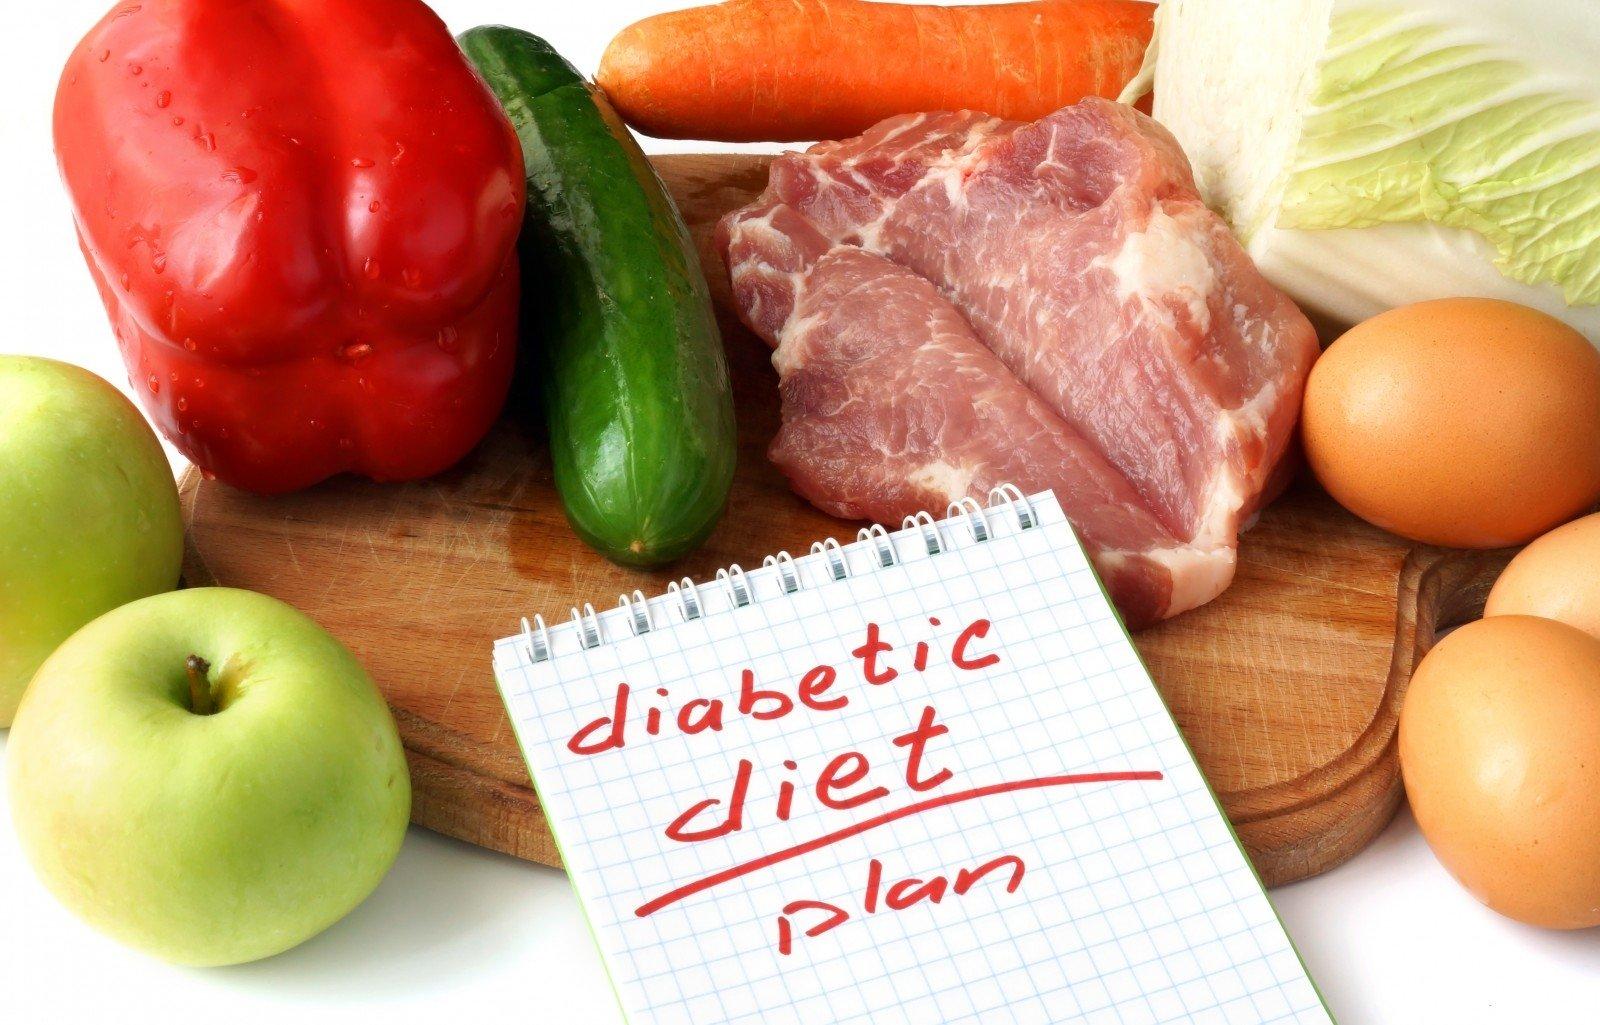 maisto produktai, naudingi sergant hipertenzija